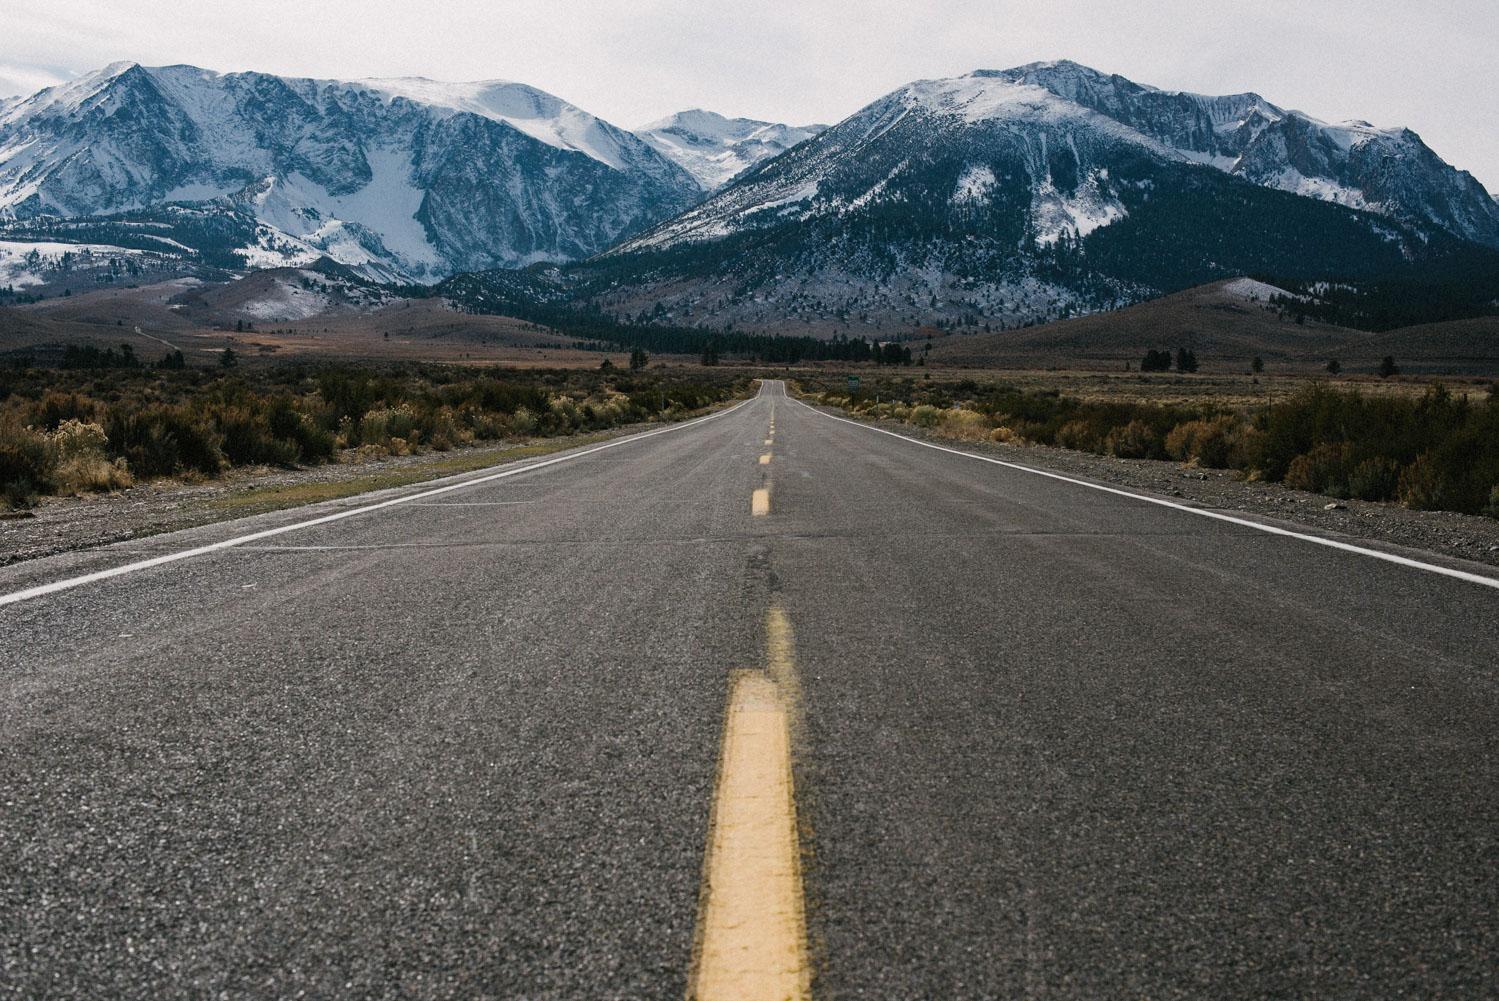 road in Yosemite park